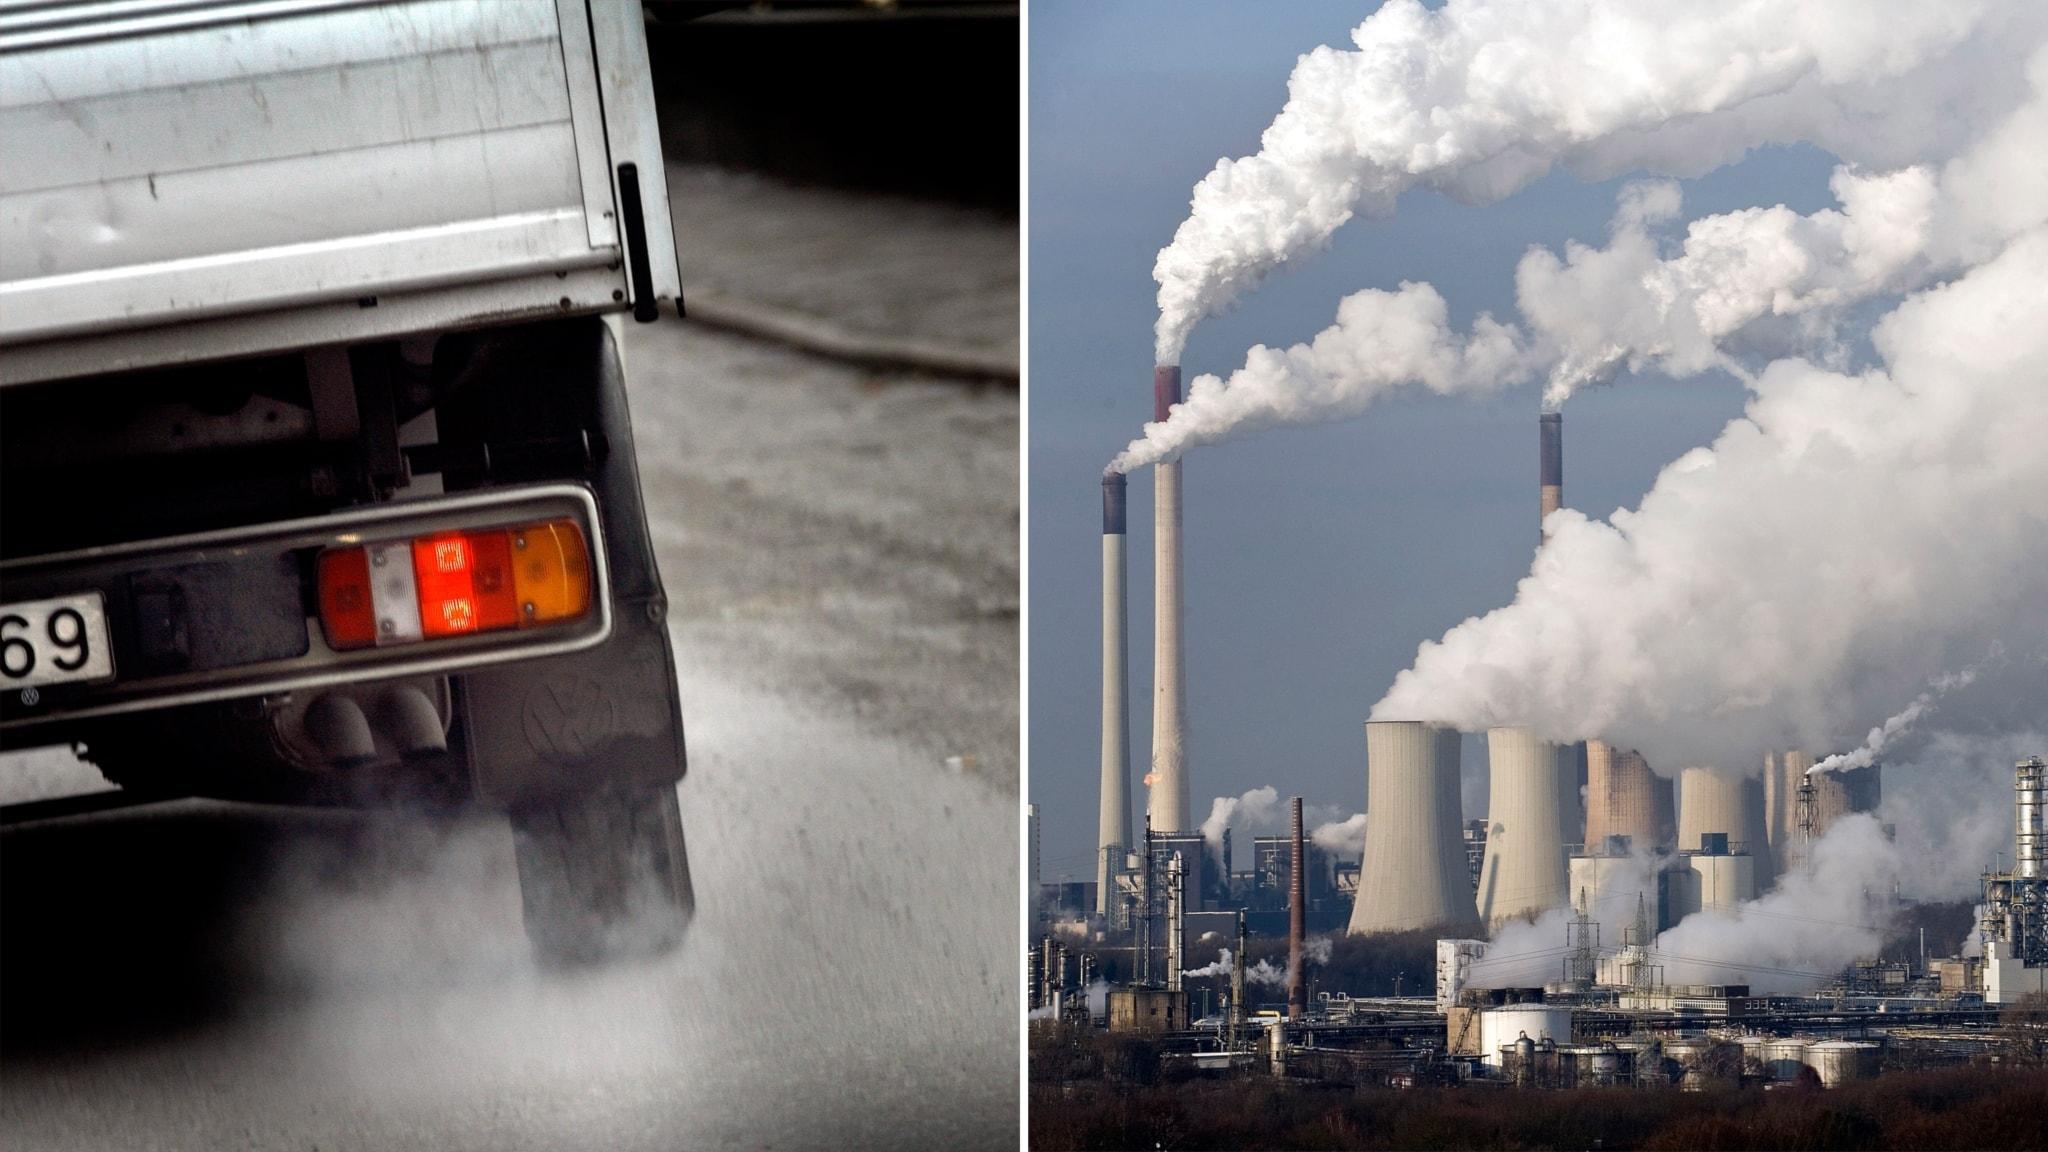 Koldioxidutslappen slar nya rekord